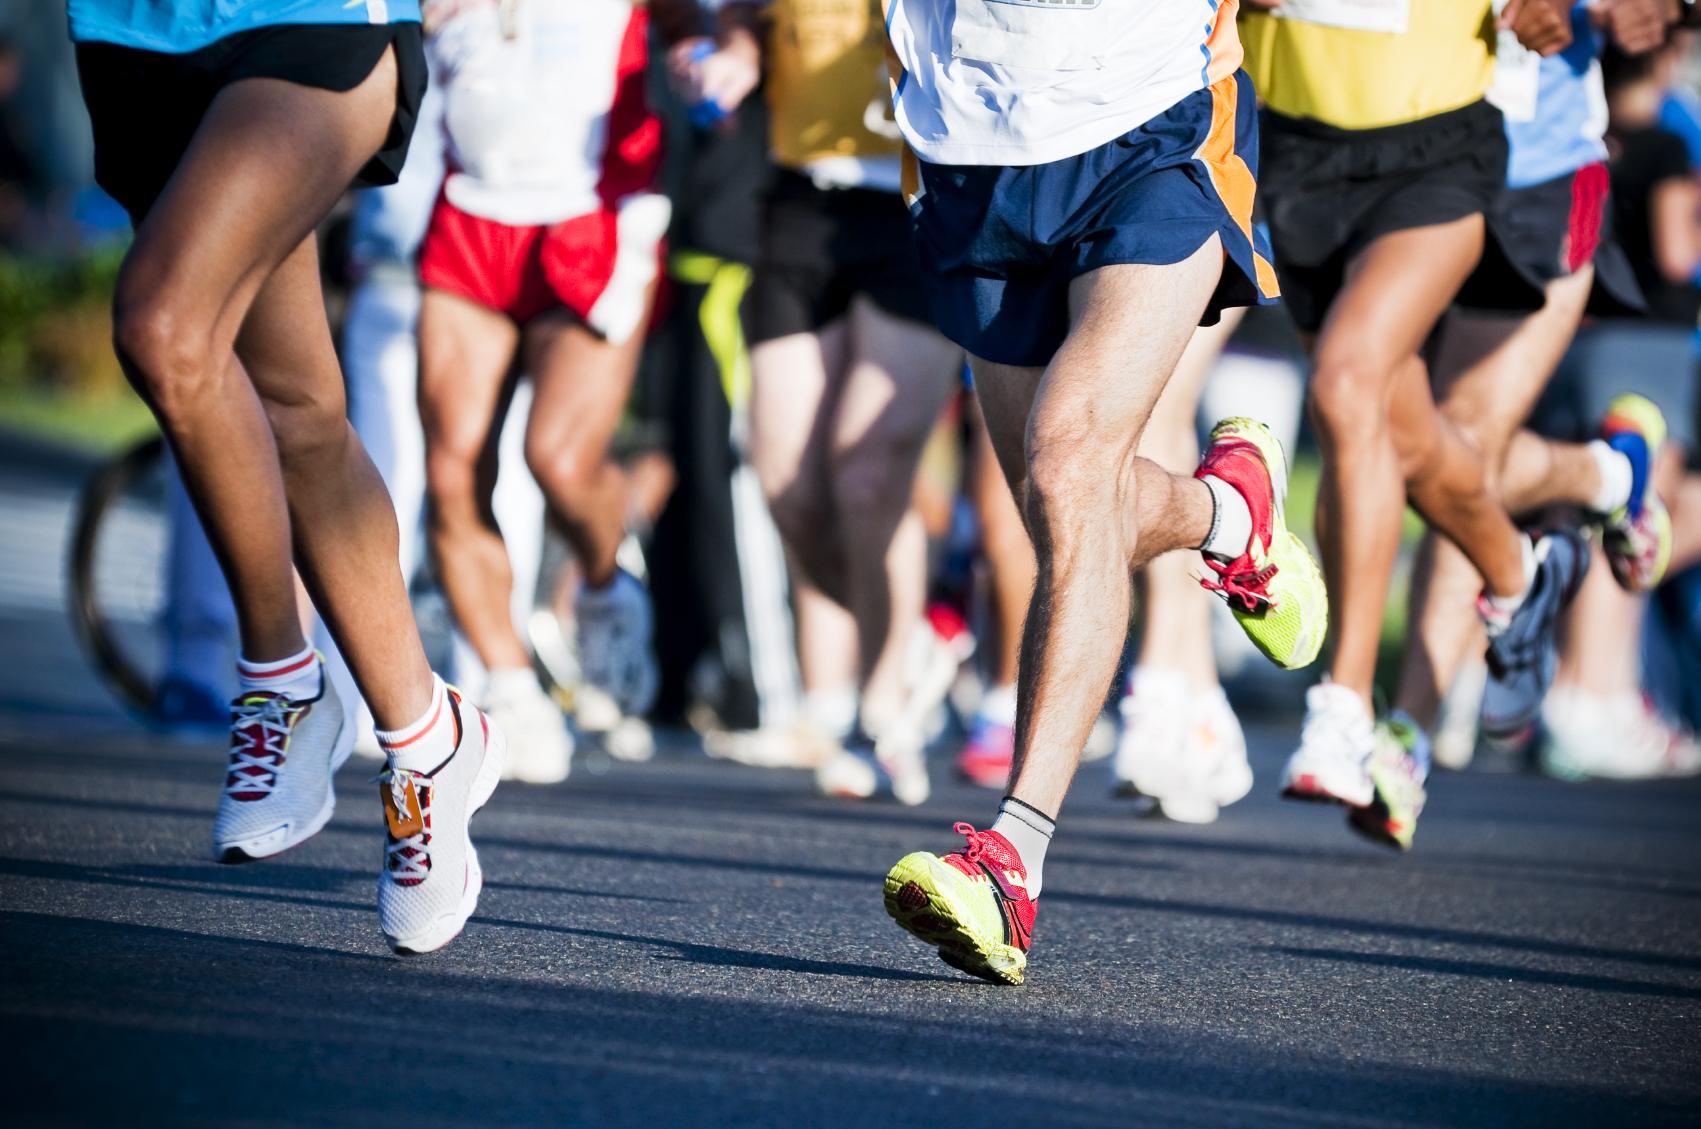 Грандиозный Dnipro Eco Marathon